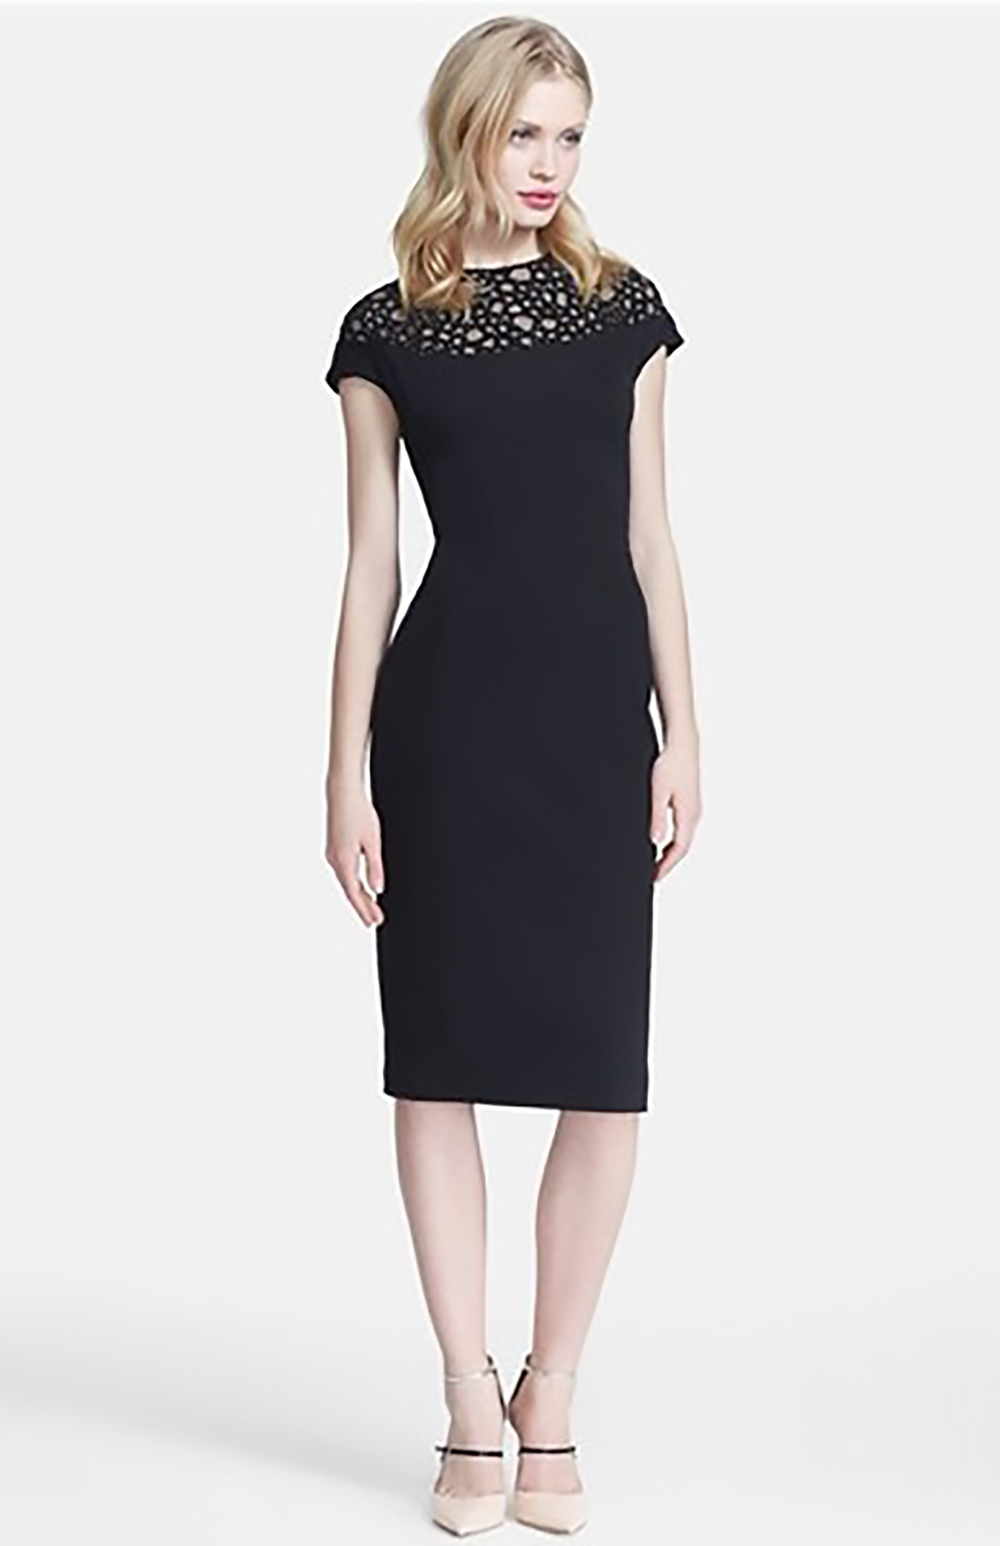 The Work Look — Work Essentials. The sheath dress